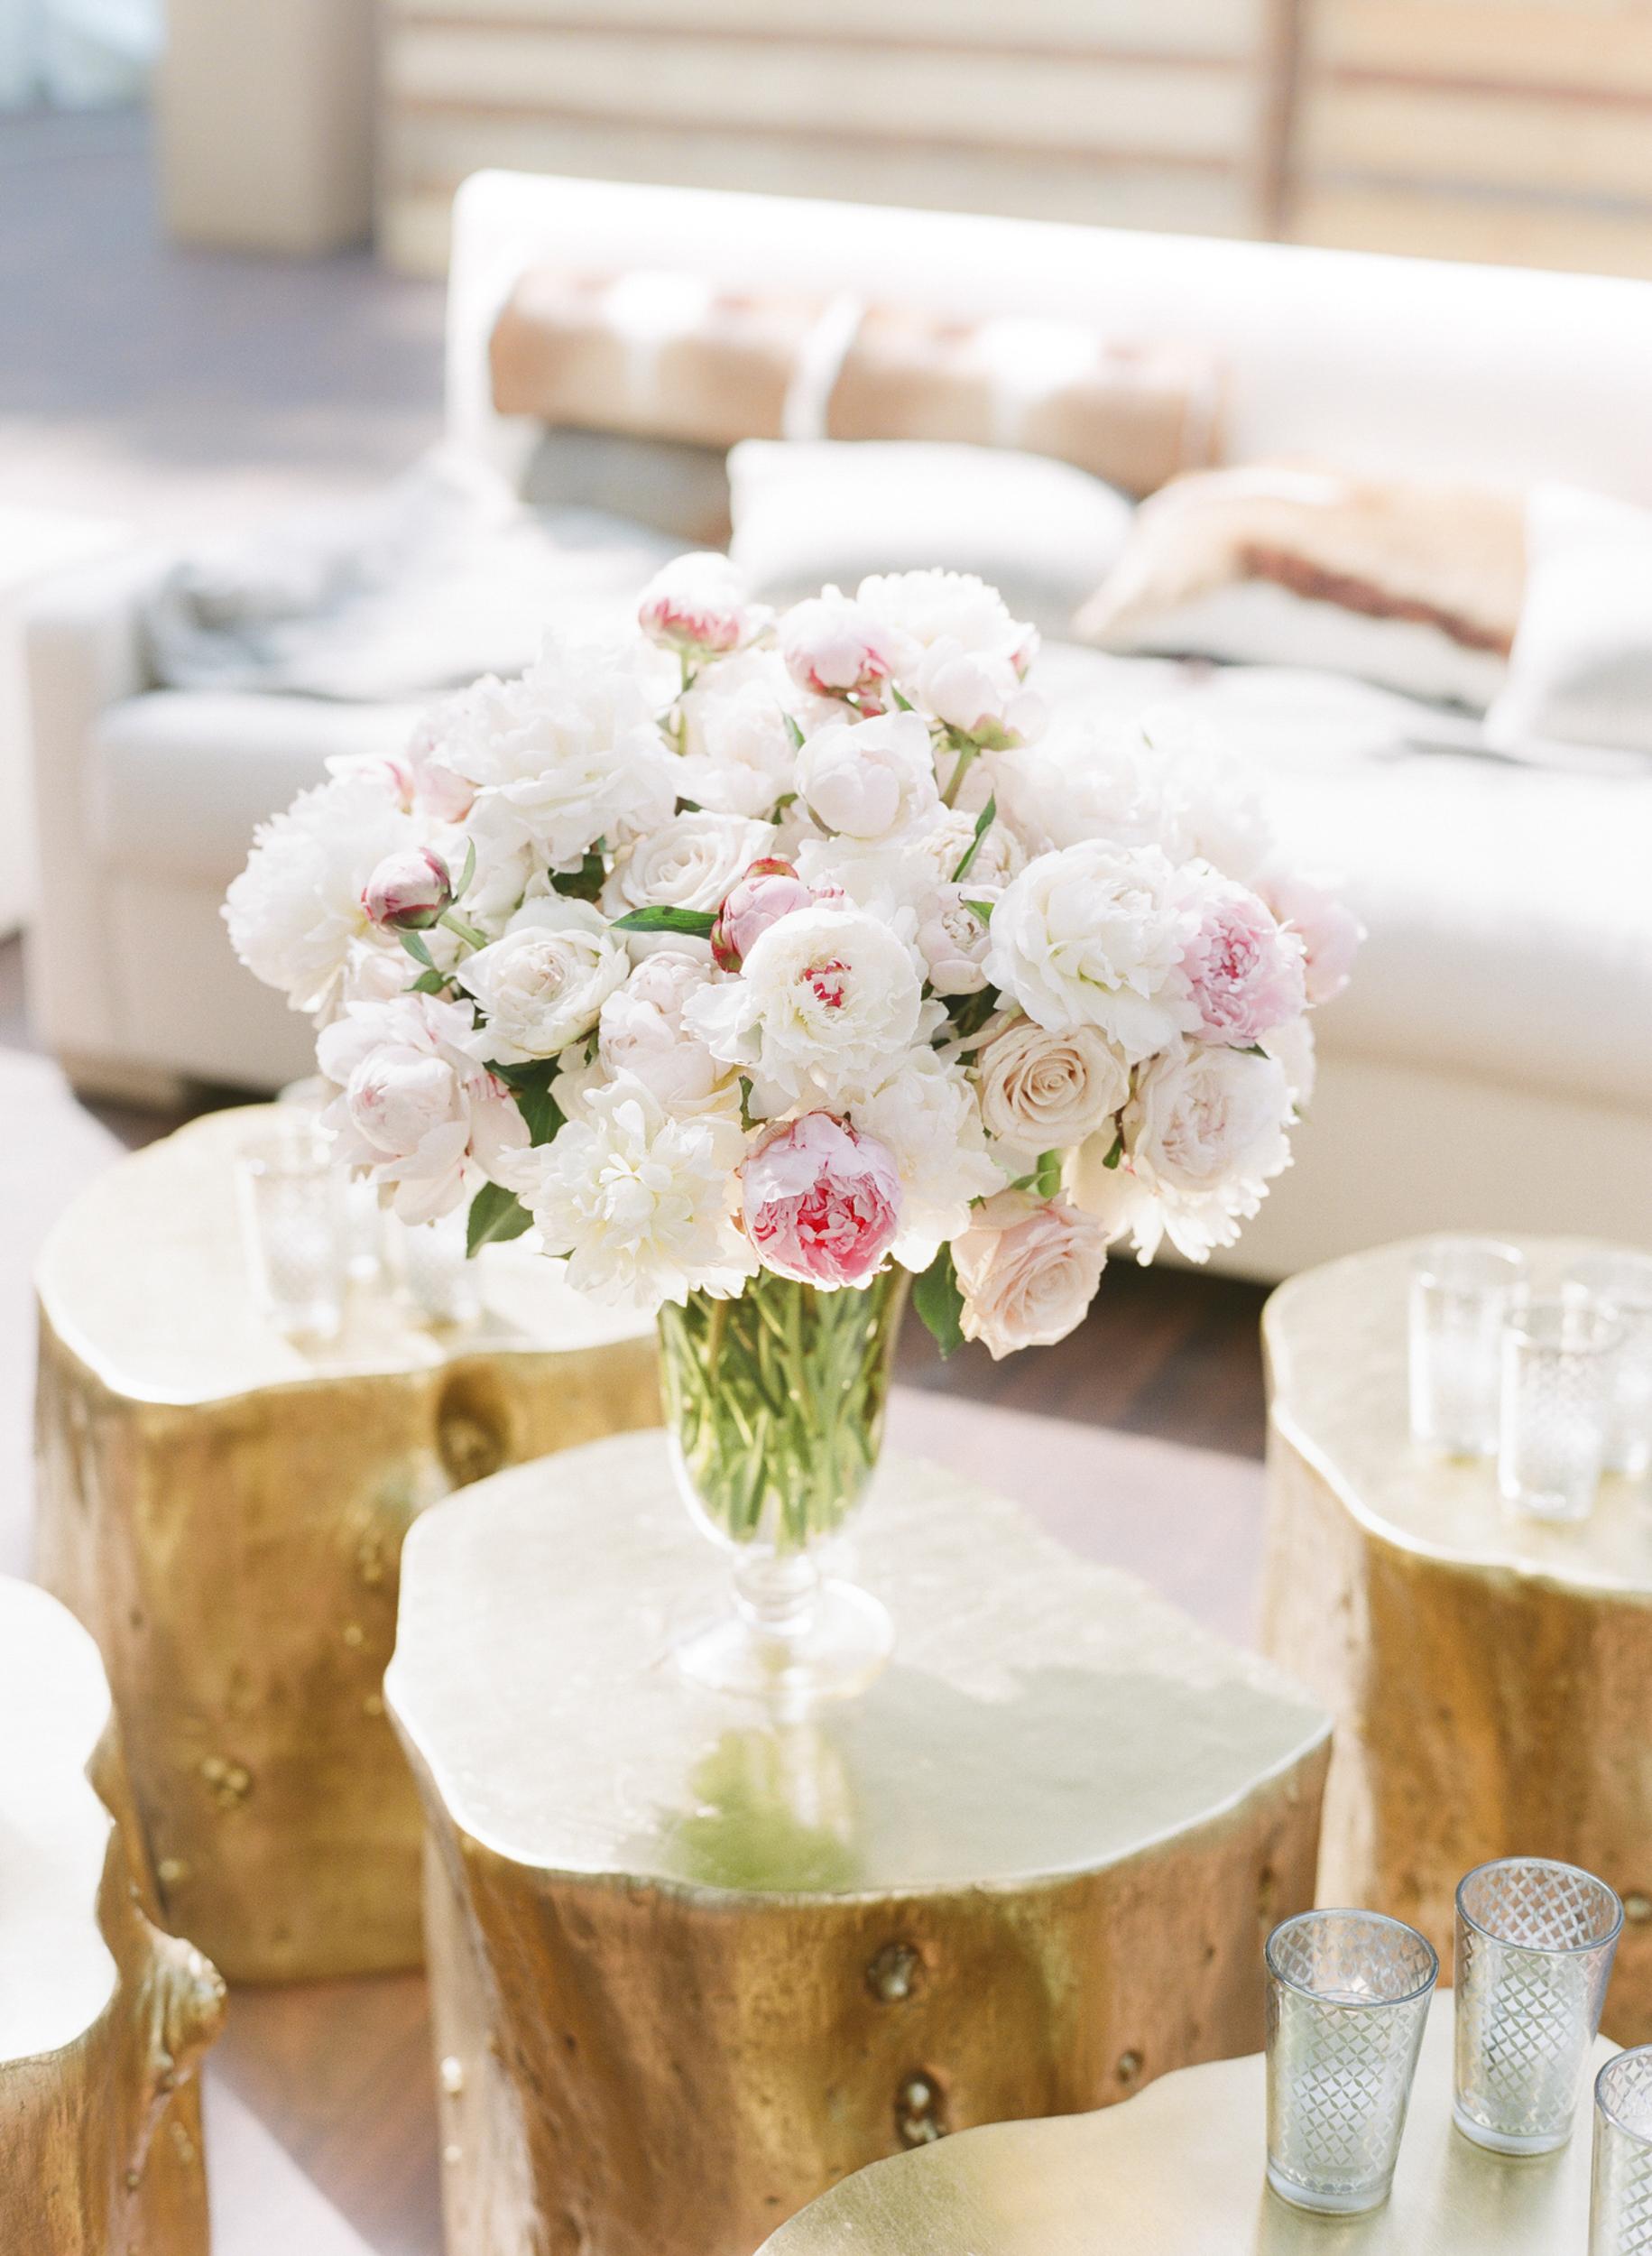 south_carolina_farm_wedding_rustic_chic_surprise_secret_luxe_wedding_bachelorette_emily_maynard_real_weddings-11.jpg